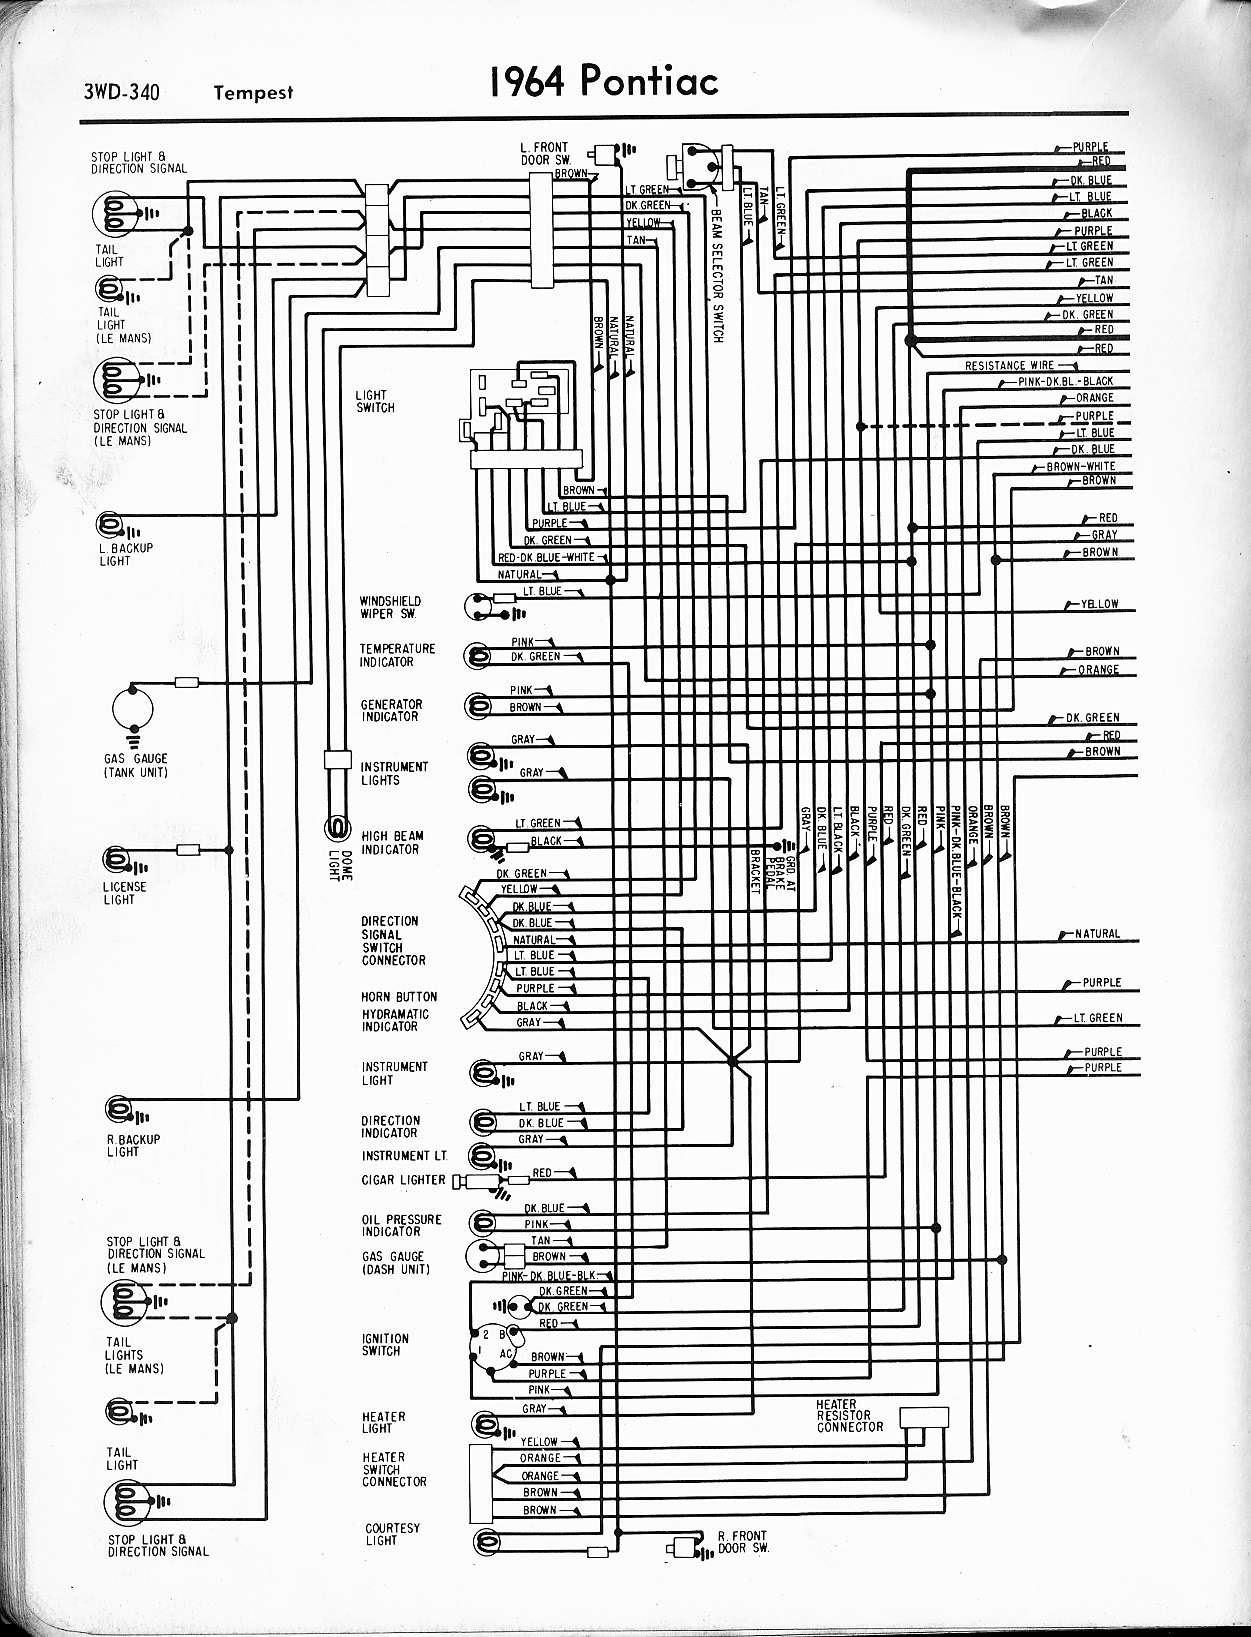 69 Gto Wiring Diagram - Wiring Diagram Networks   2005 Gto Gauge Cluster Wire Diagram      Wiring Diagram Networks - blogger